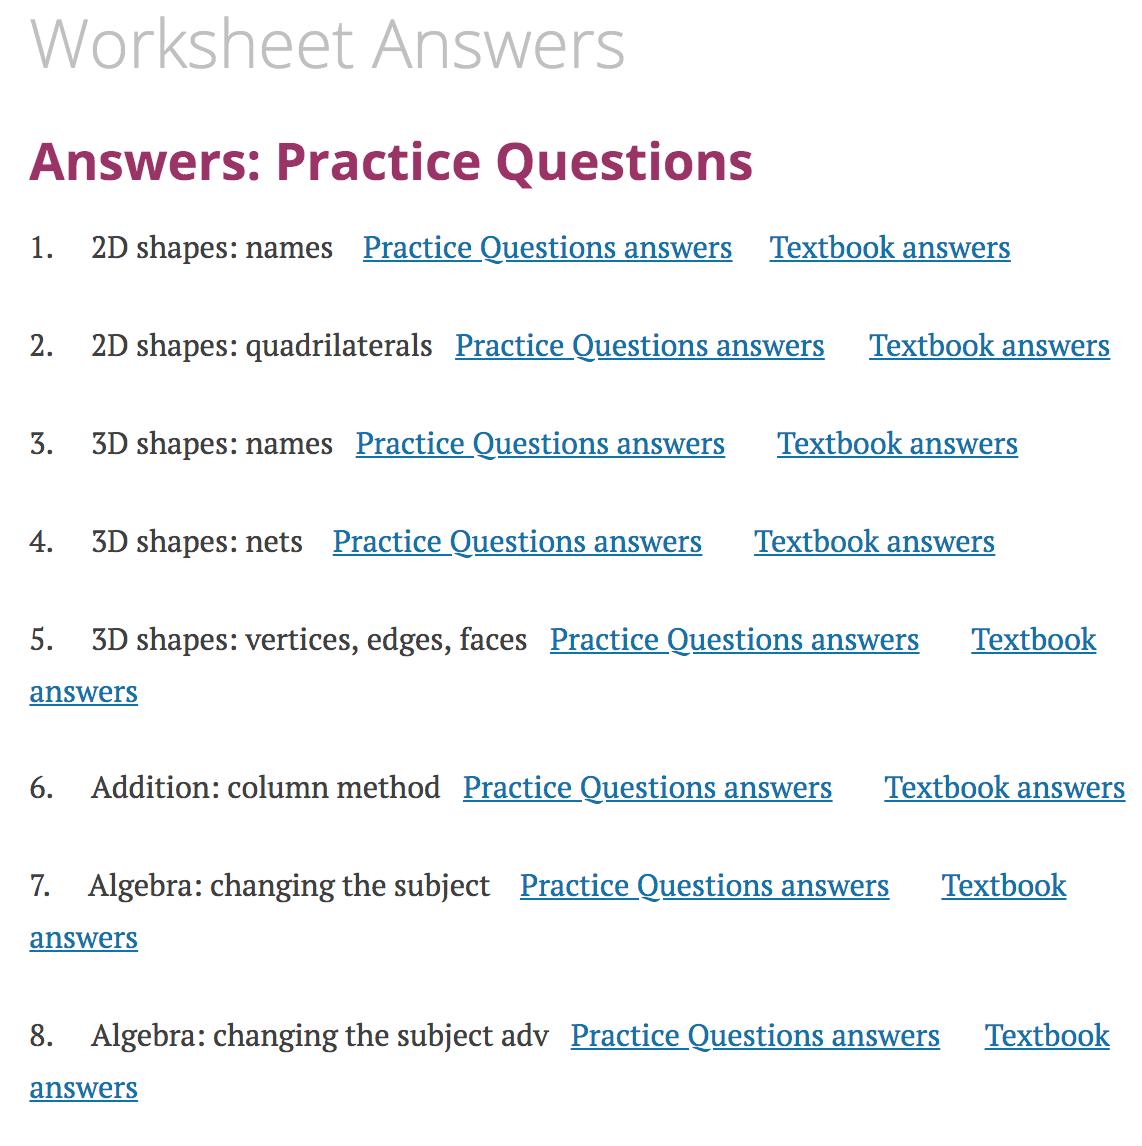 Worksheet Answers Corbettmaths [ 1146 x 1142 Pixel ]